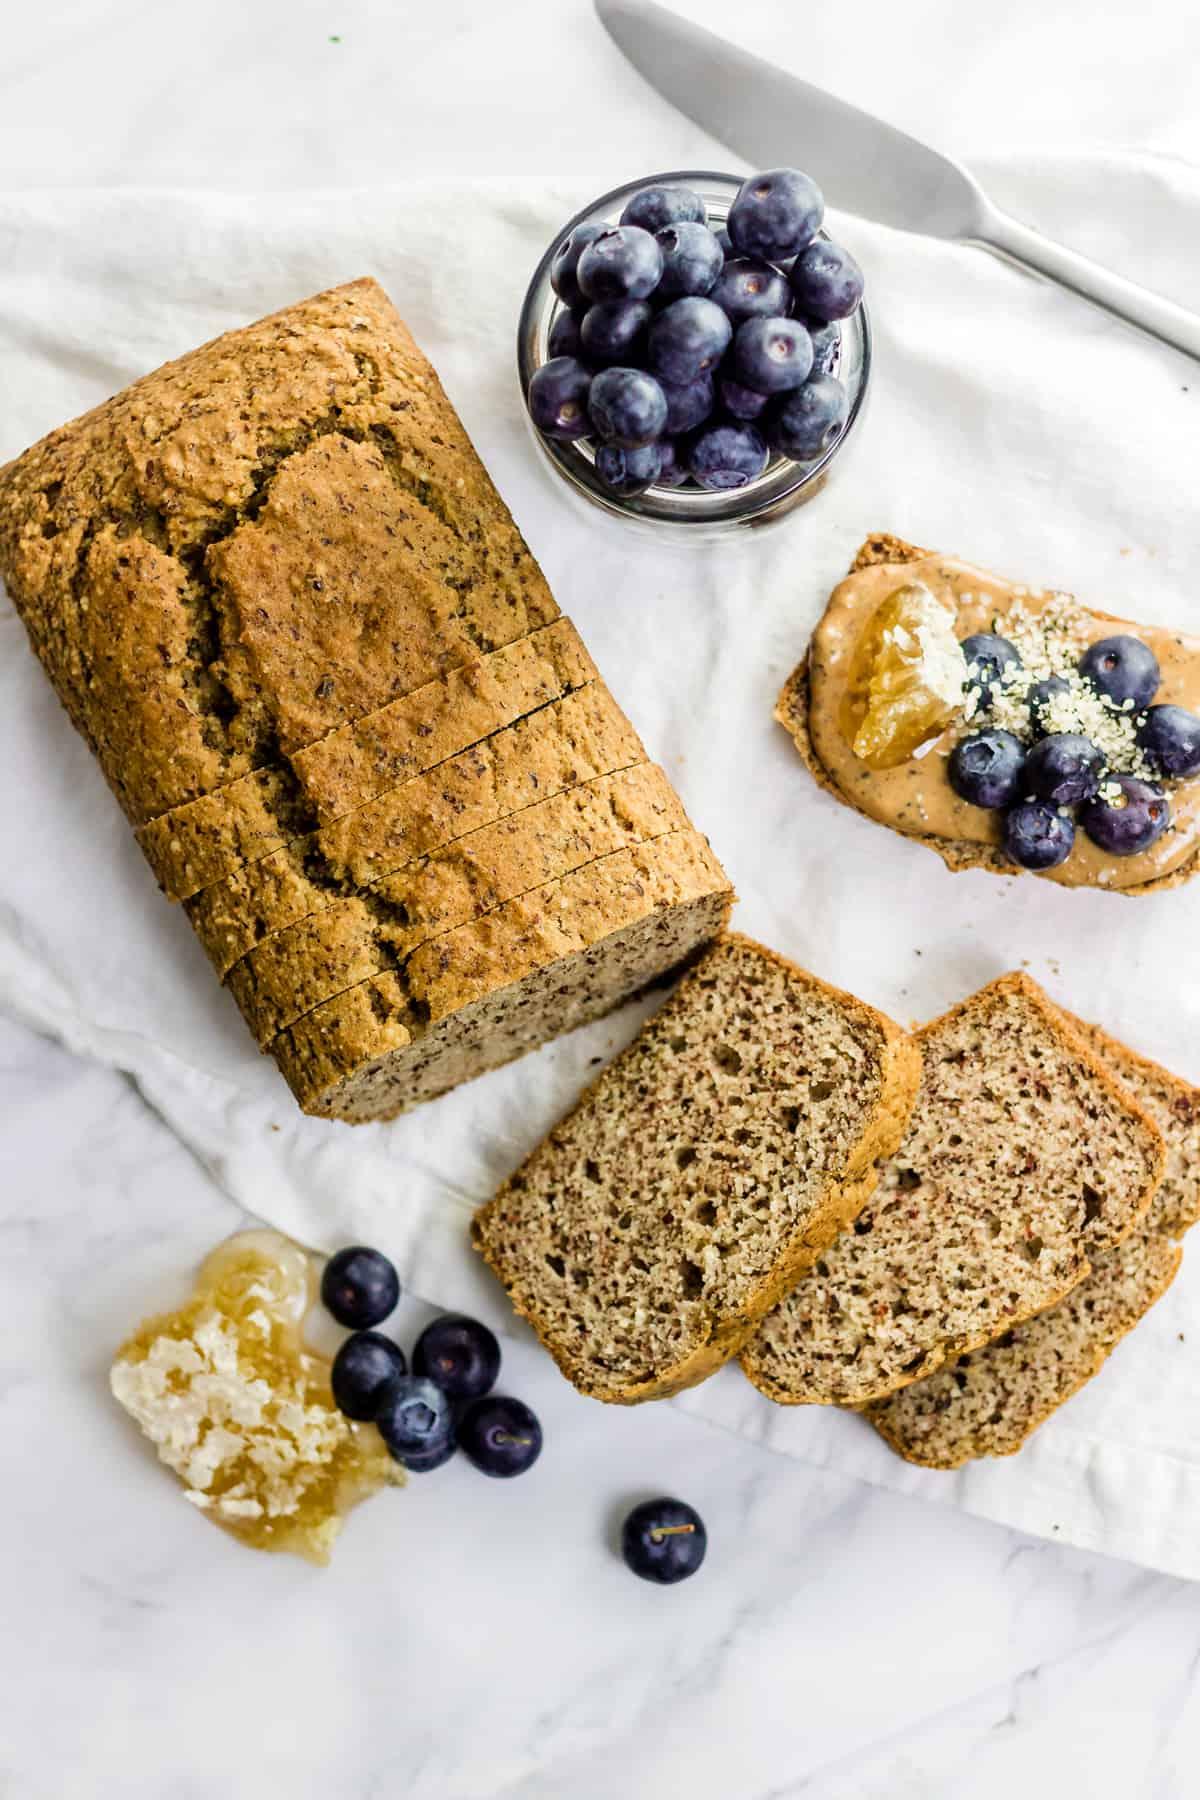 Paleo Sandwich Bread - Baked Ambrosia